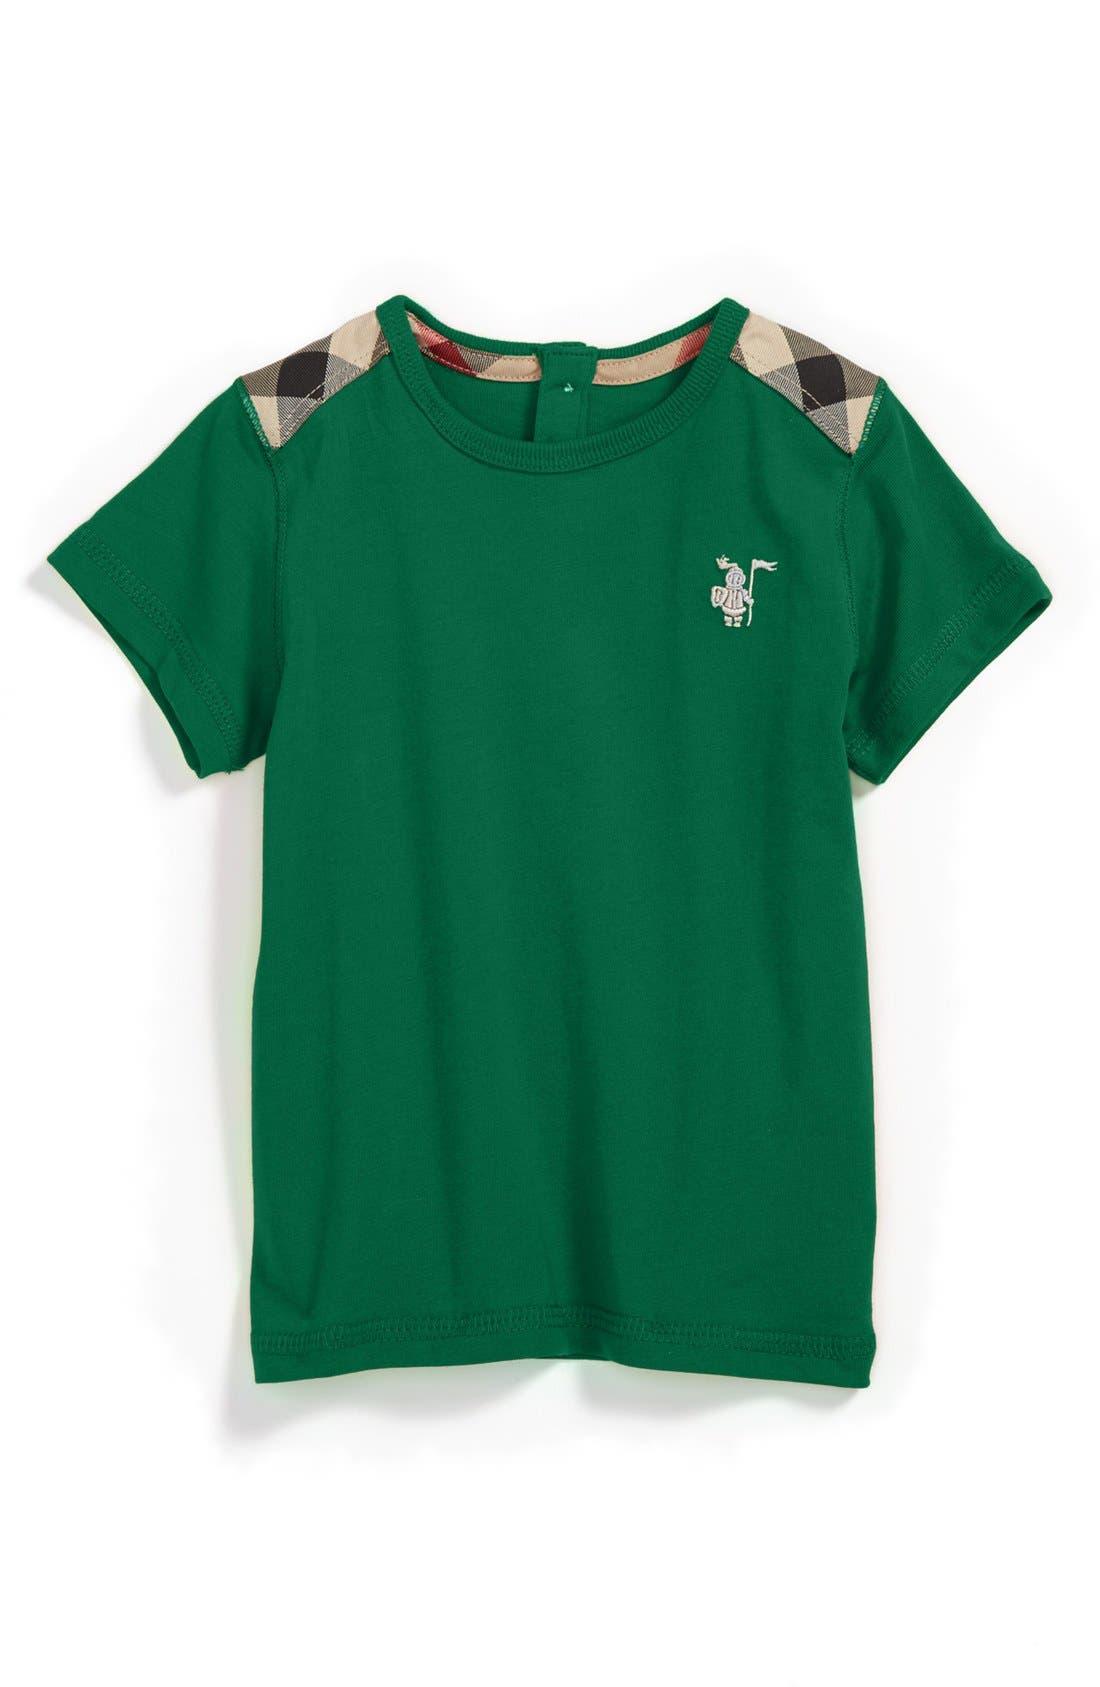 Alternate Image 1 Selected - Burberry 'Lencel' T-Shirt (Toddler Boys)